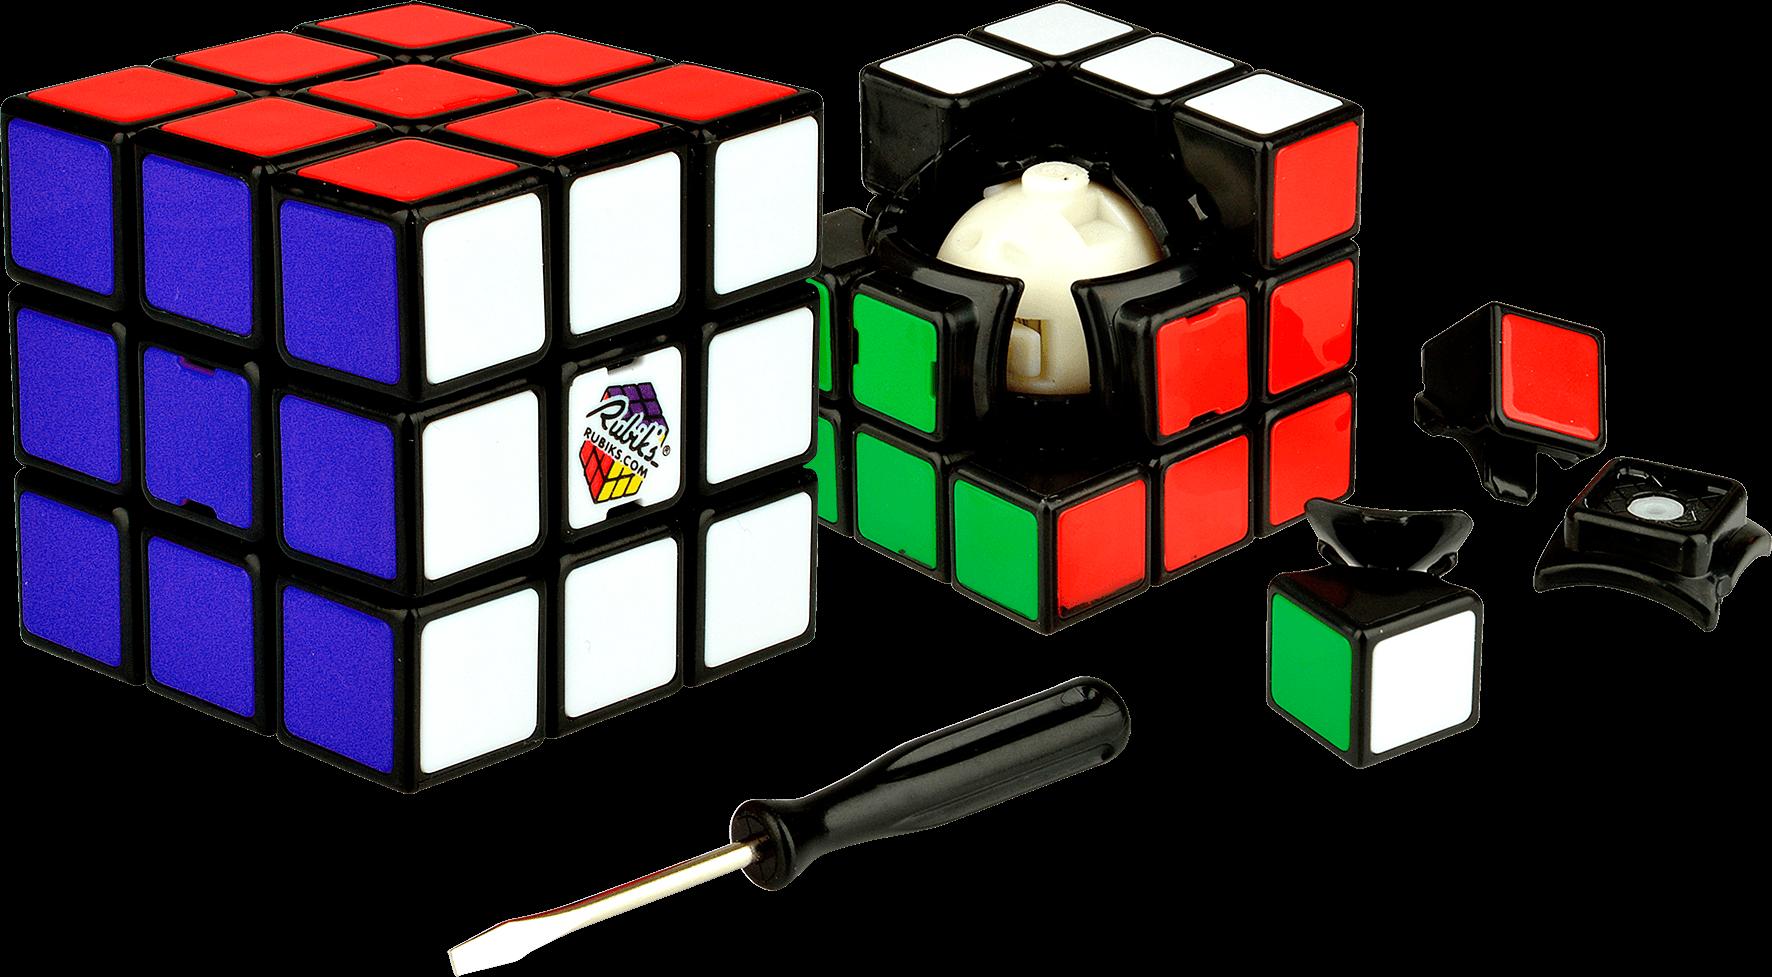 rubiks kub teknikmagasinet